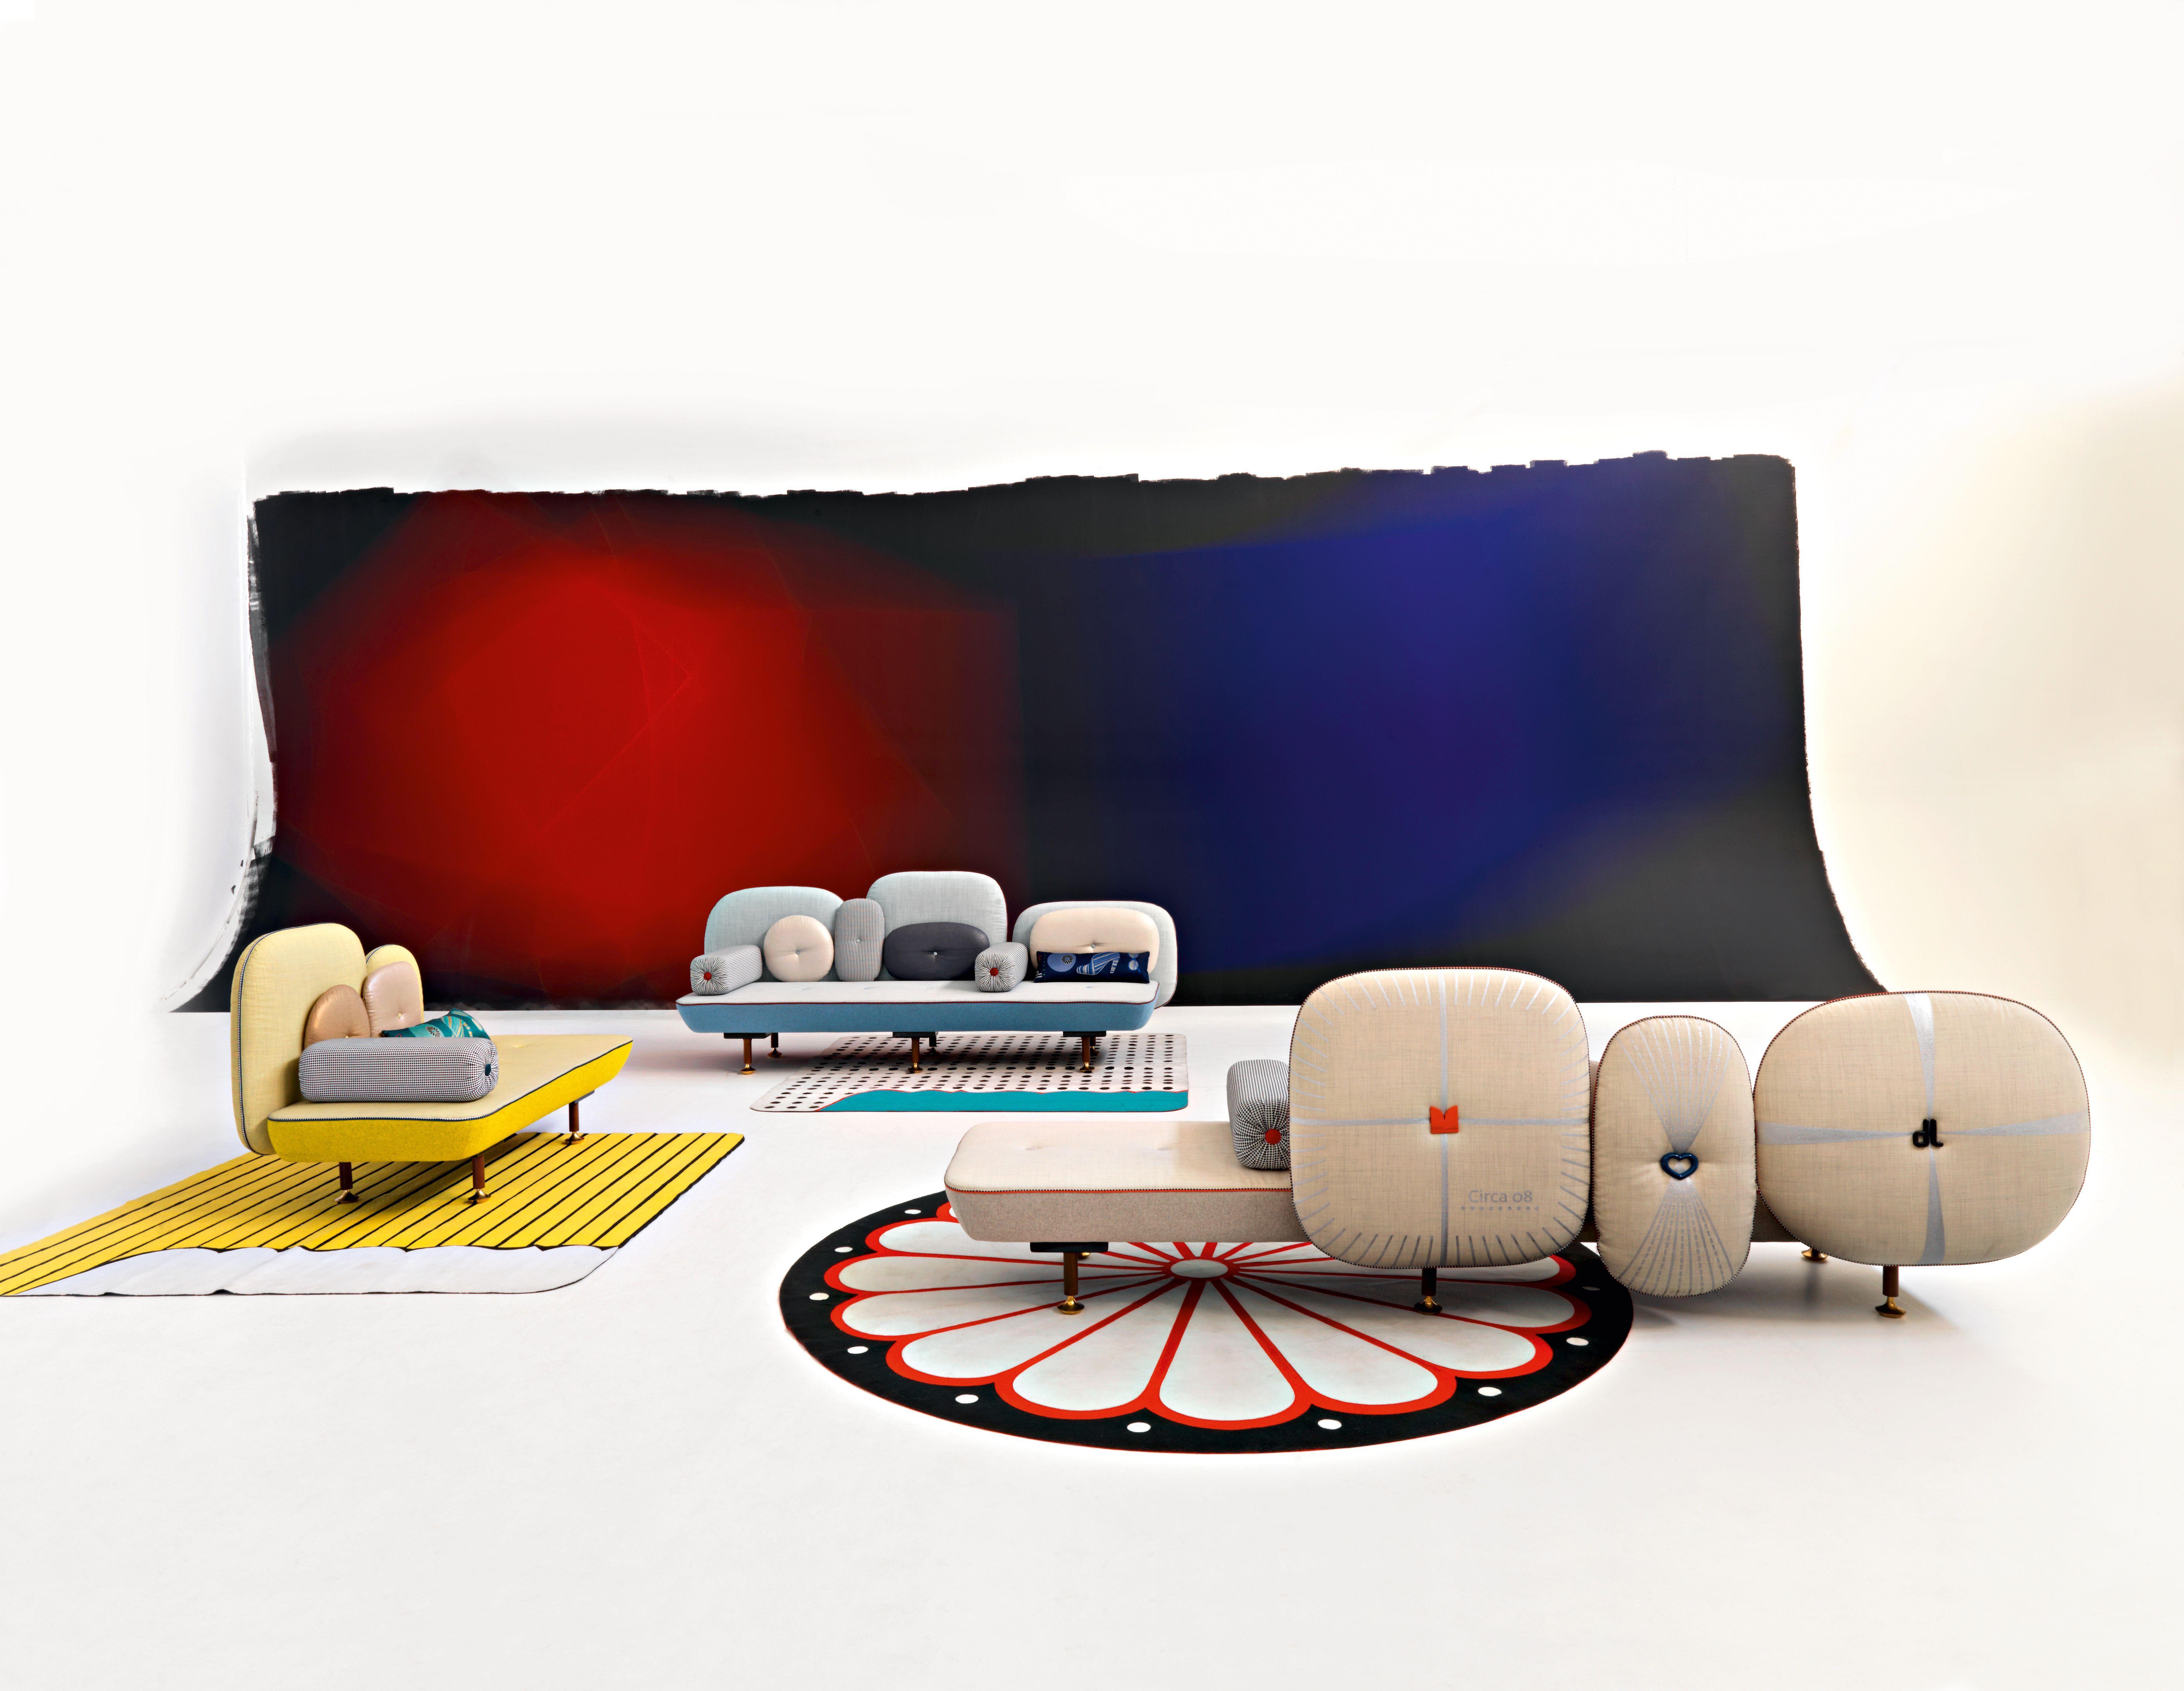 canap droit my beautiful backside l 160 cm 2 places jaune vert moroso. Black Bedroom Furniture Sets. Home Design Ideas